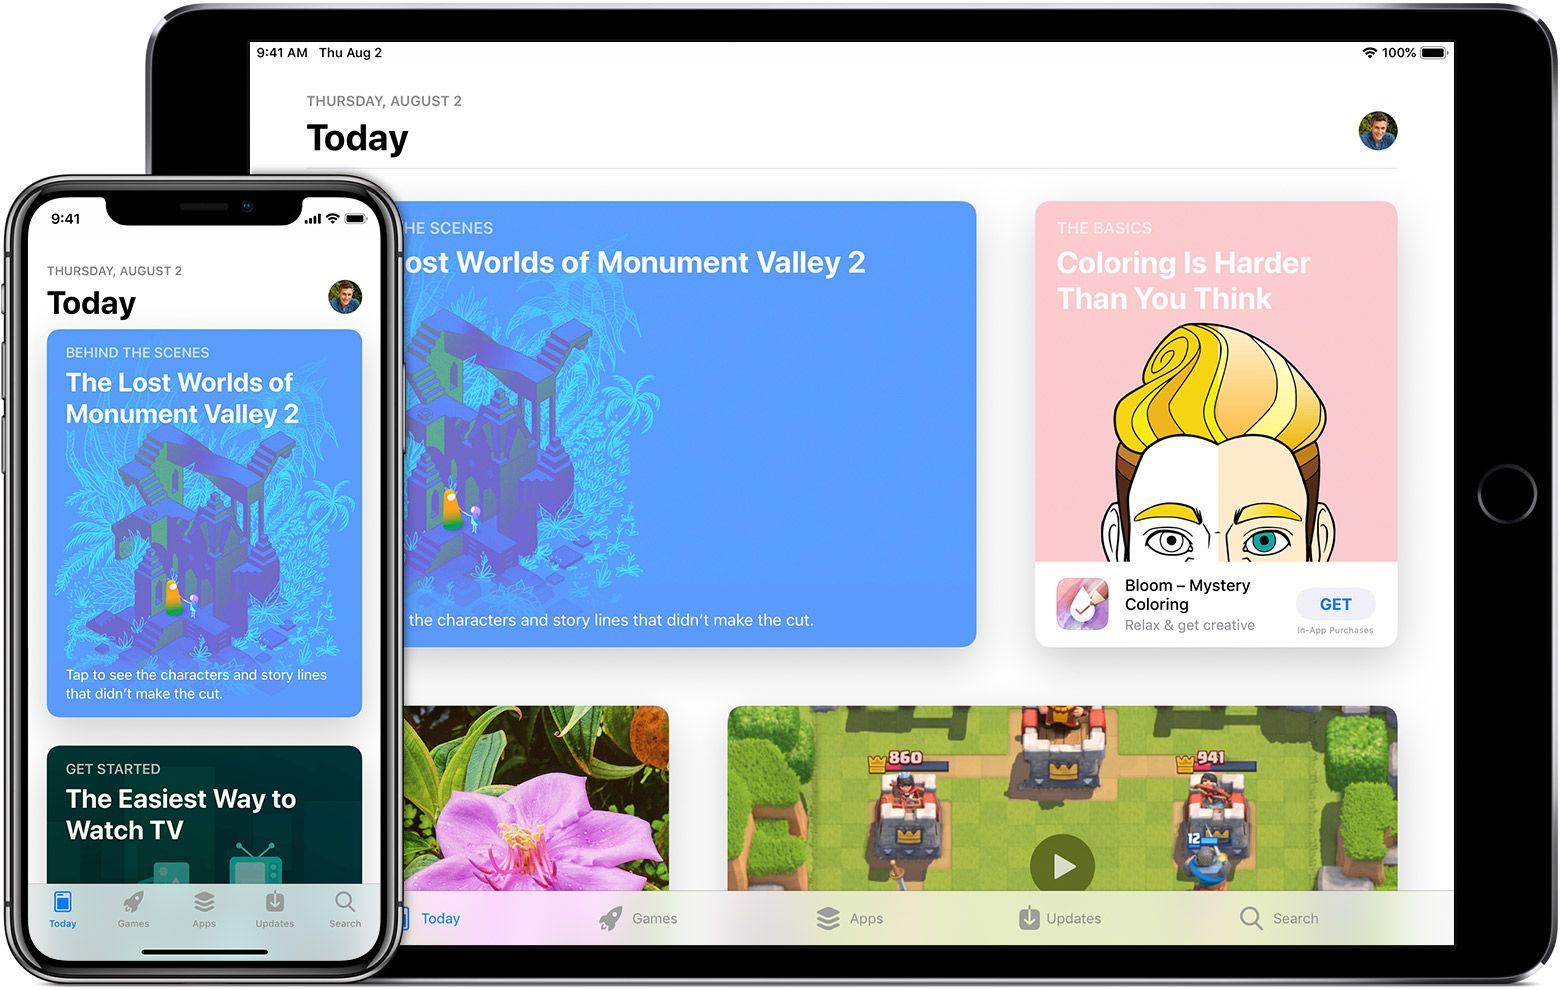 The App Store Review Process Appstore Applenews App App Store Games Apple Watch Apps App